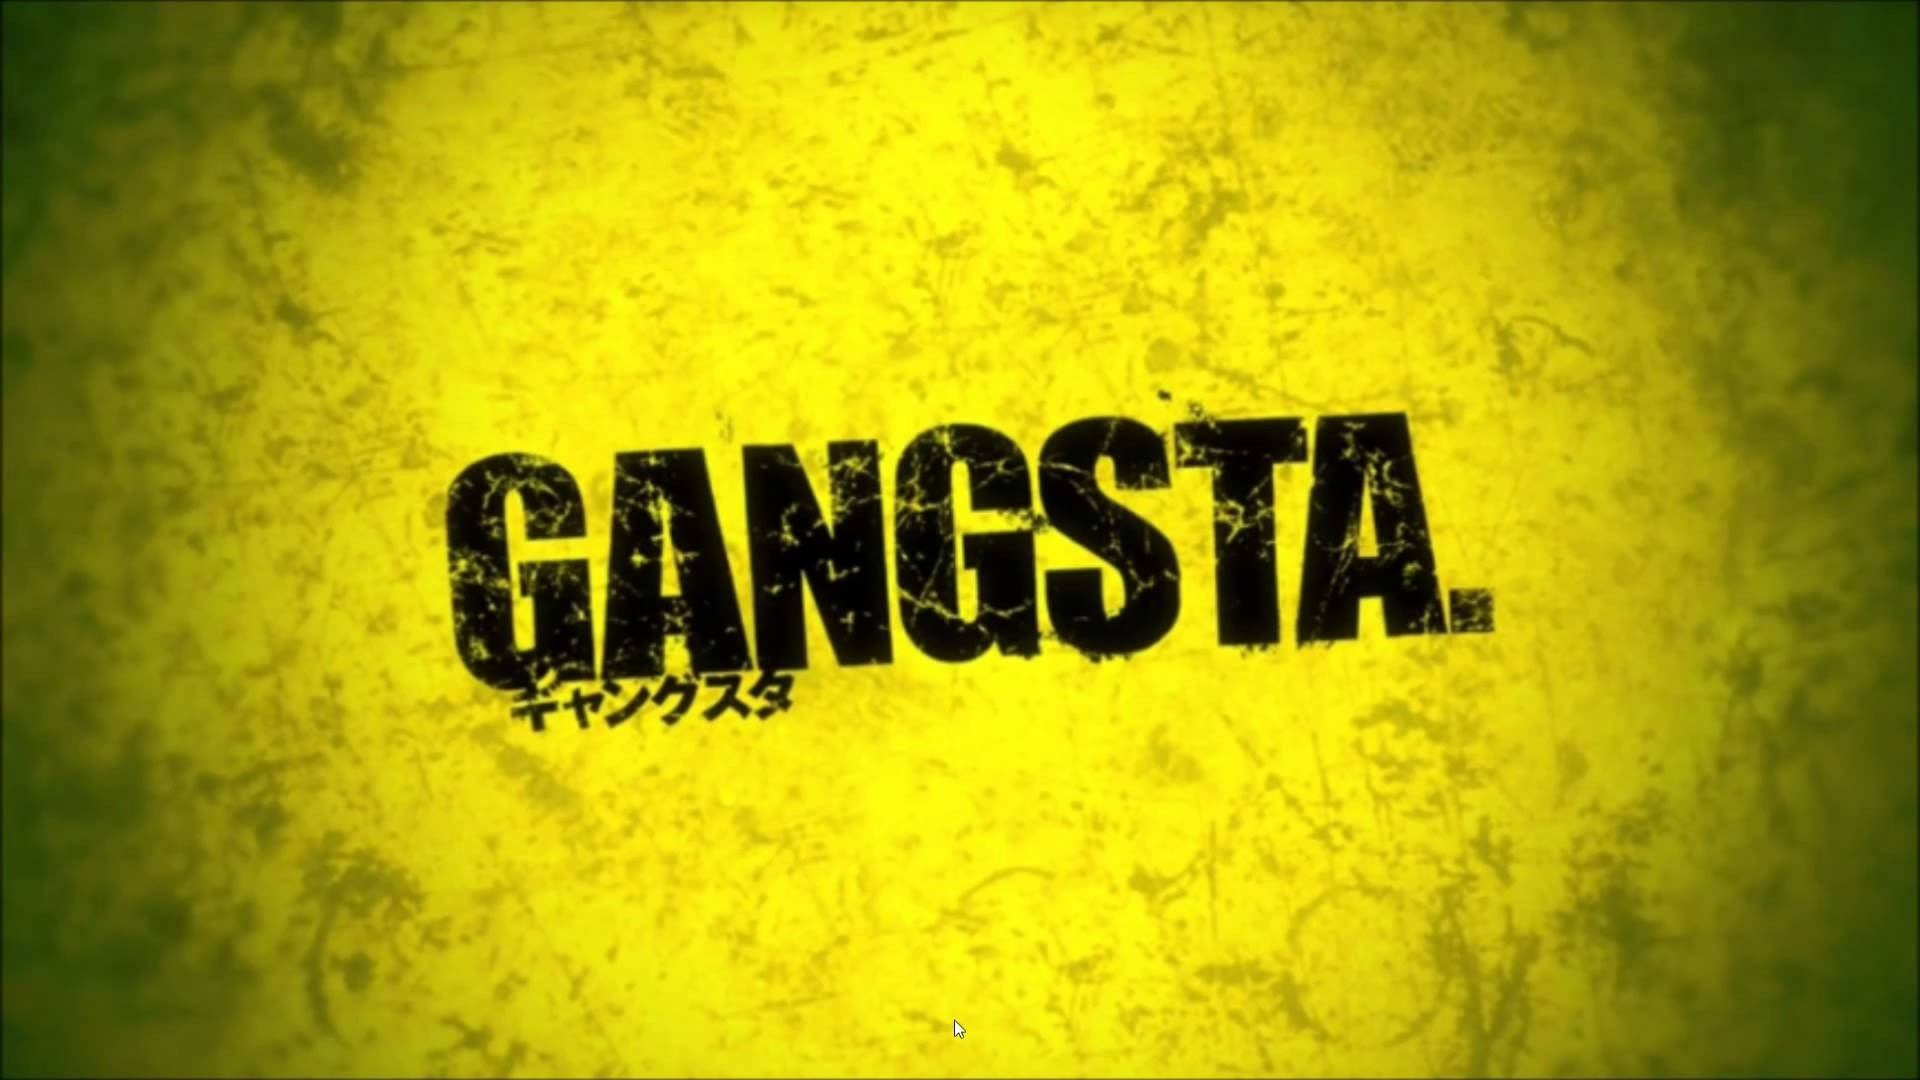 Gangsta wallpaper 69 images 1920x1200 wallpaper gangsta hd backgrounds pic wpd004408 voltagebd Choice Image